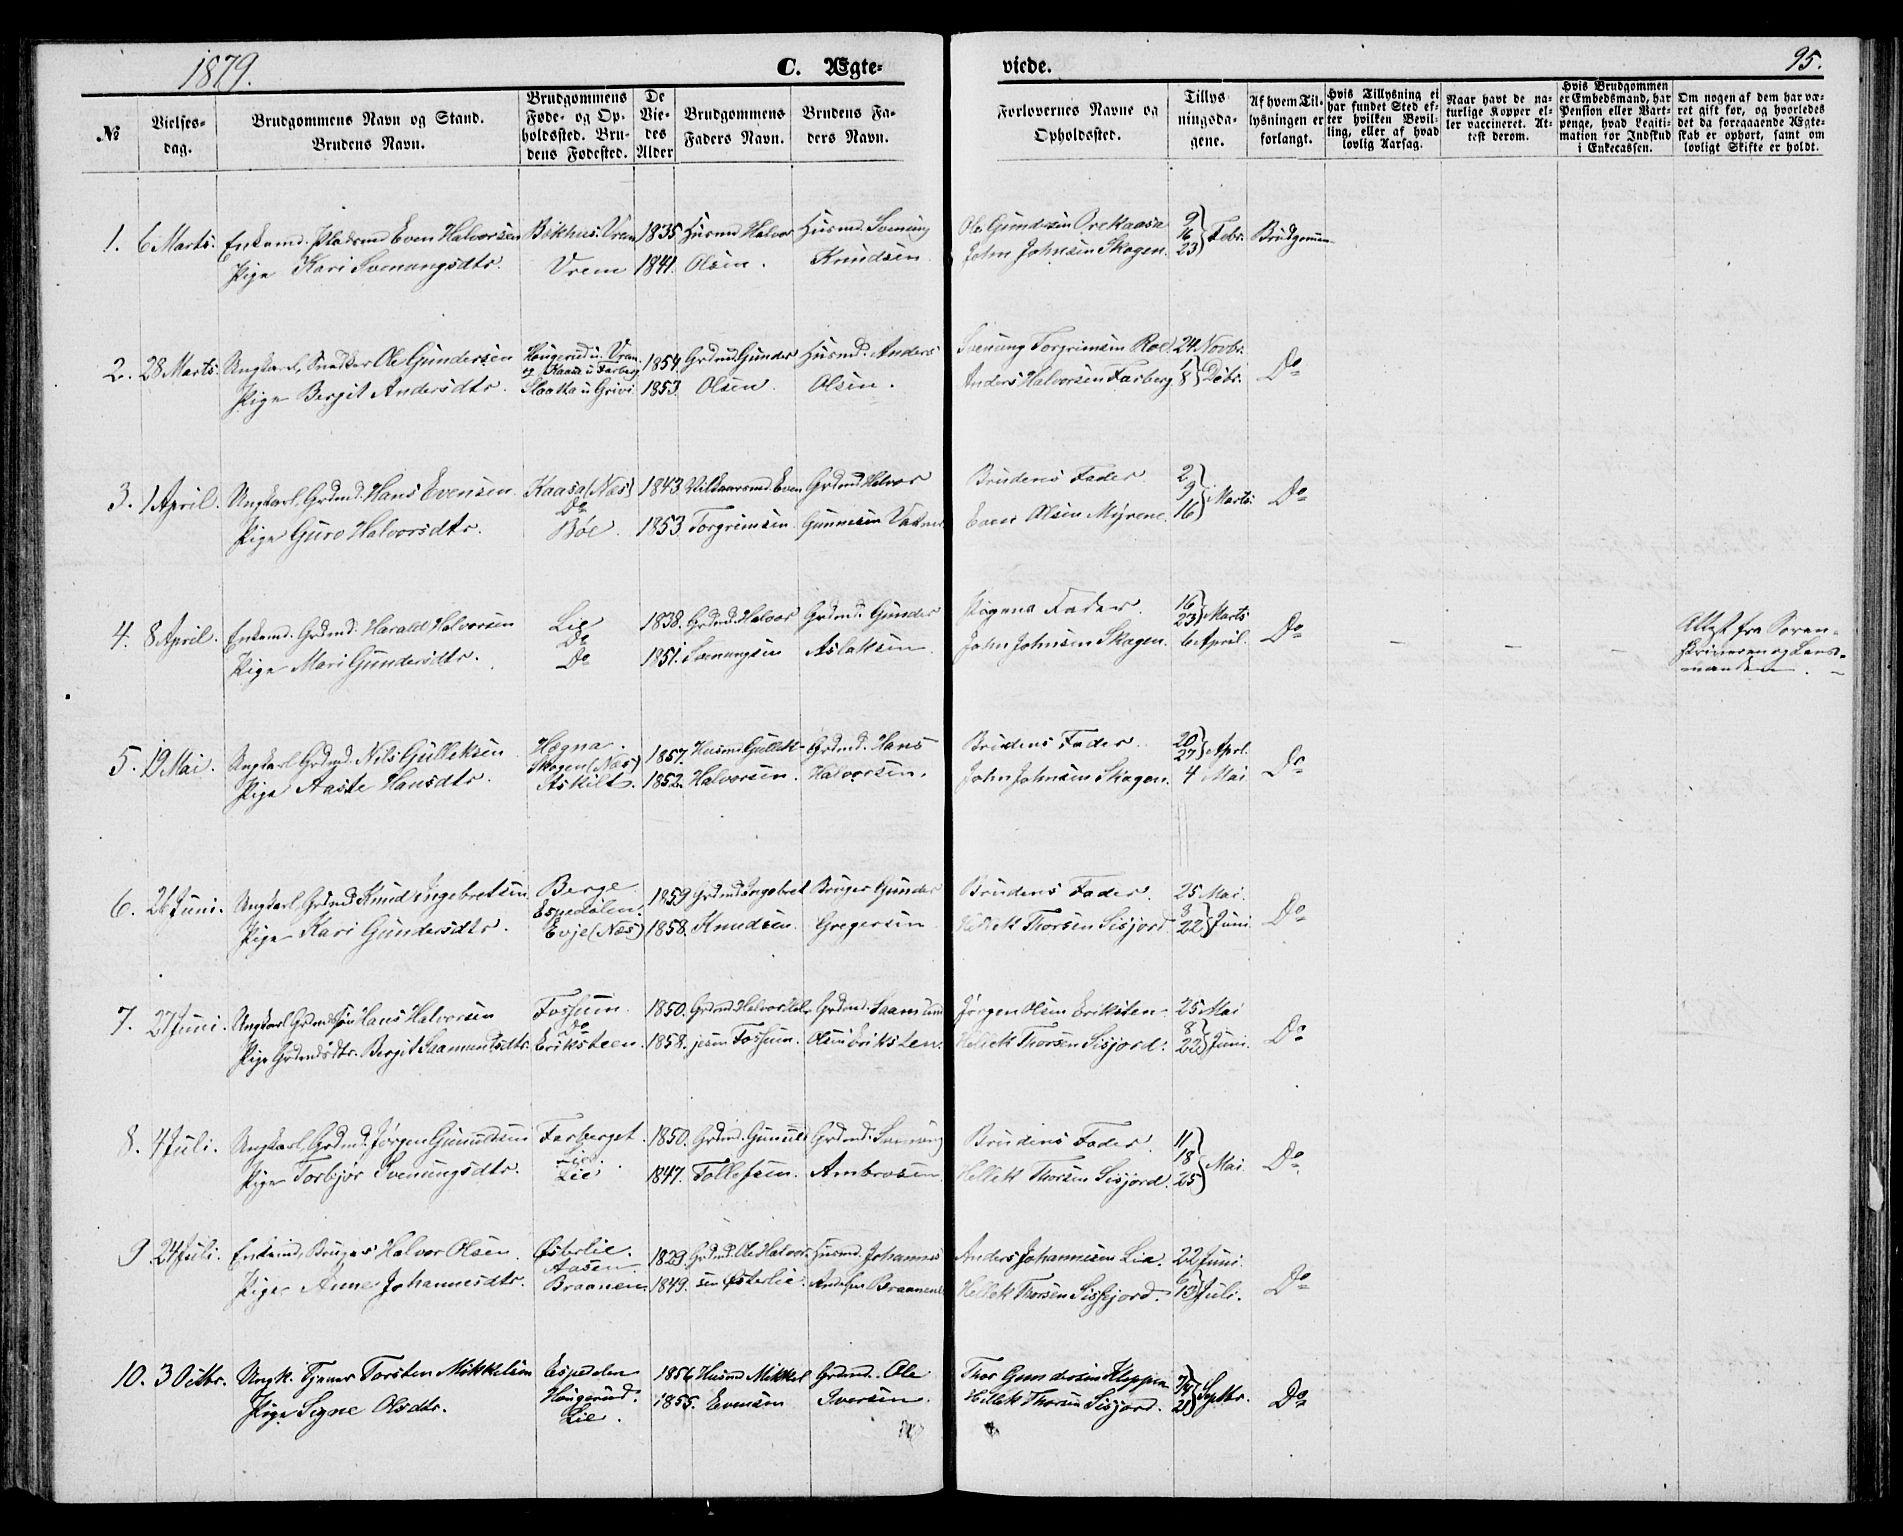 SAKO, Bø kirkebøker, G/Ga/L0004: Klokkerbok nr. 4, 1876-1882, s. 95